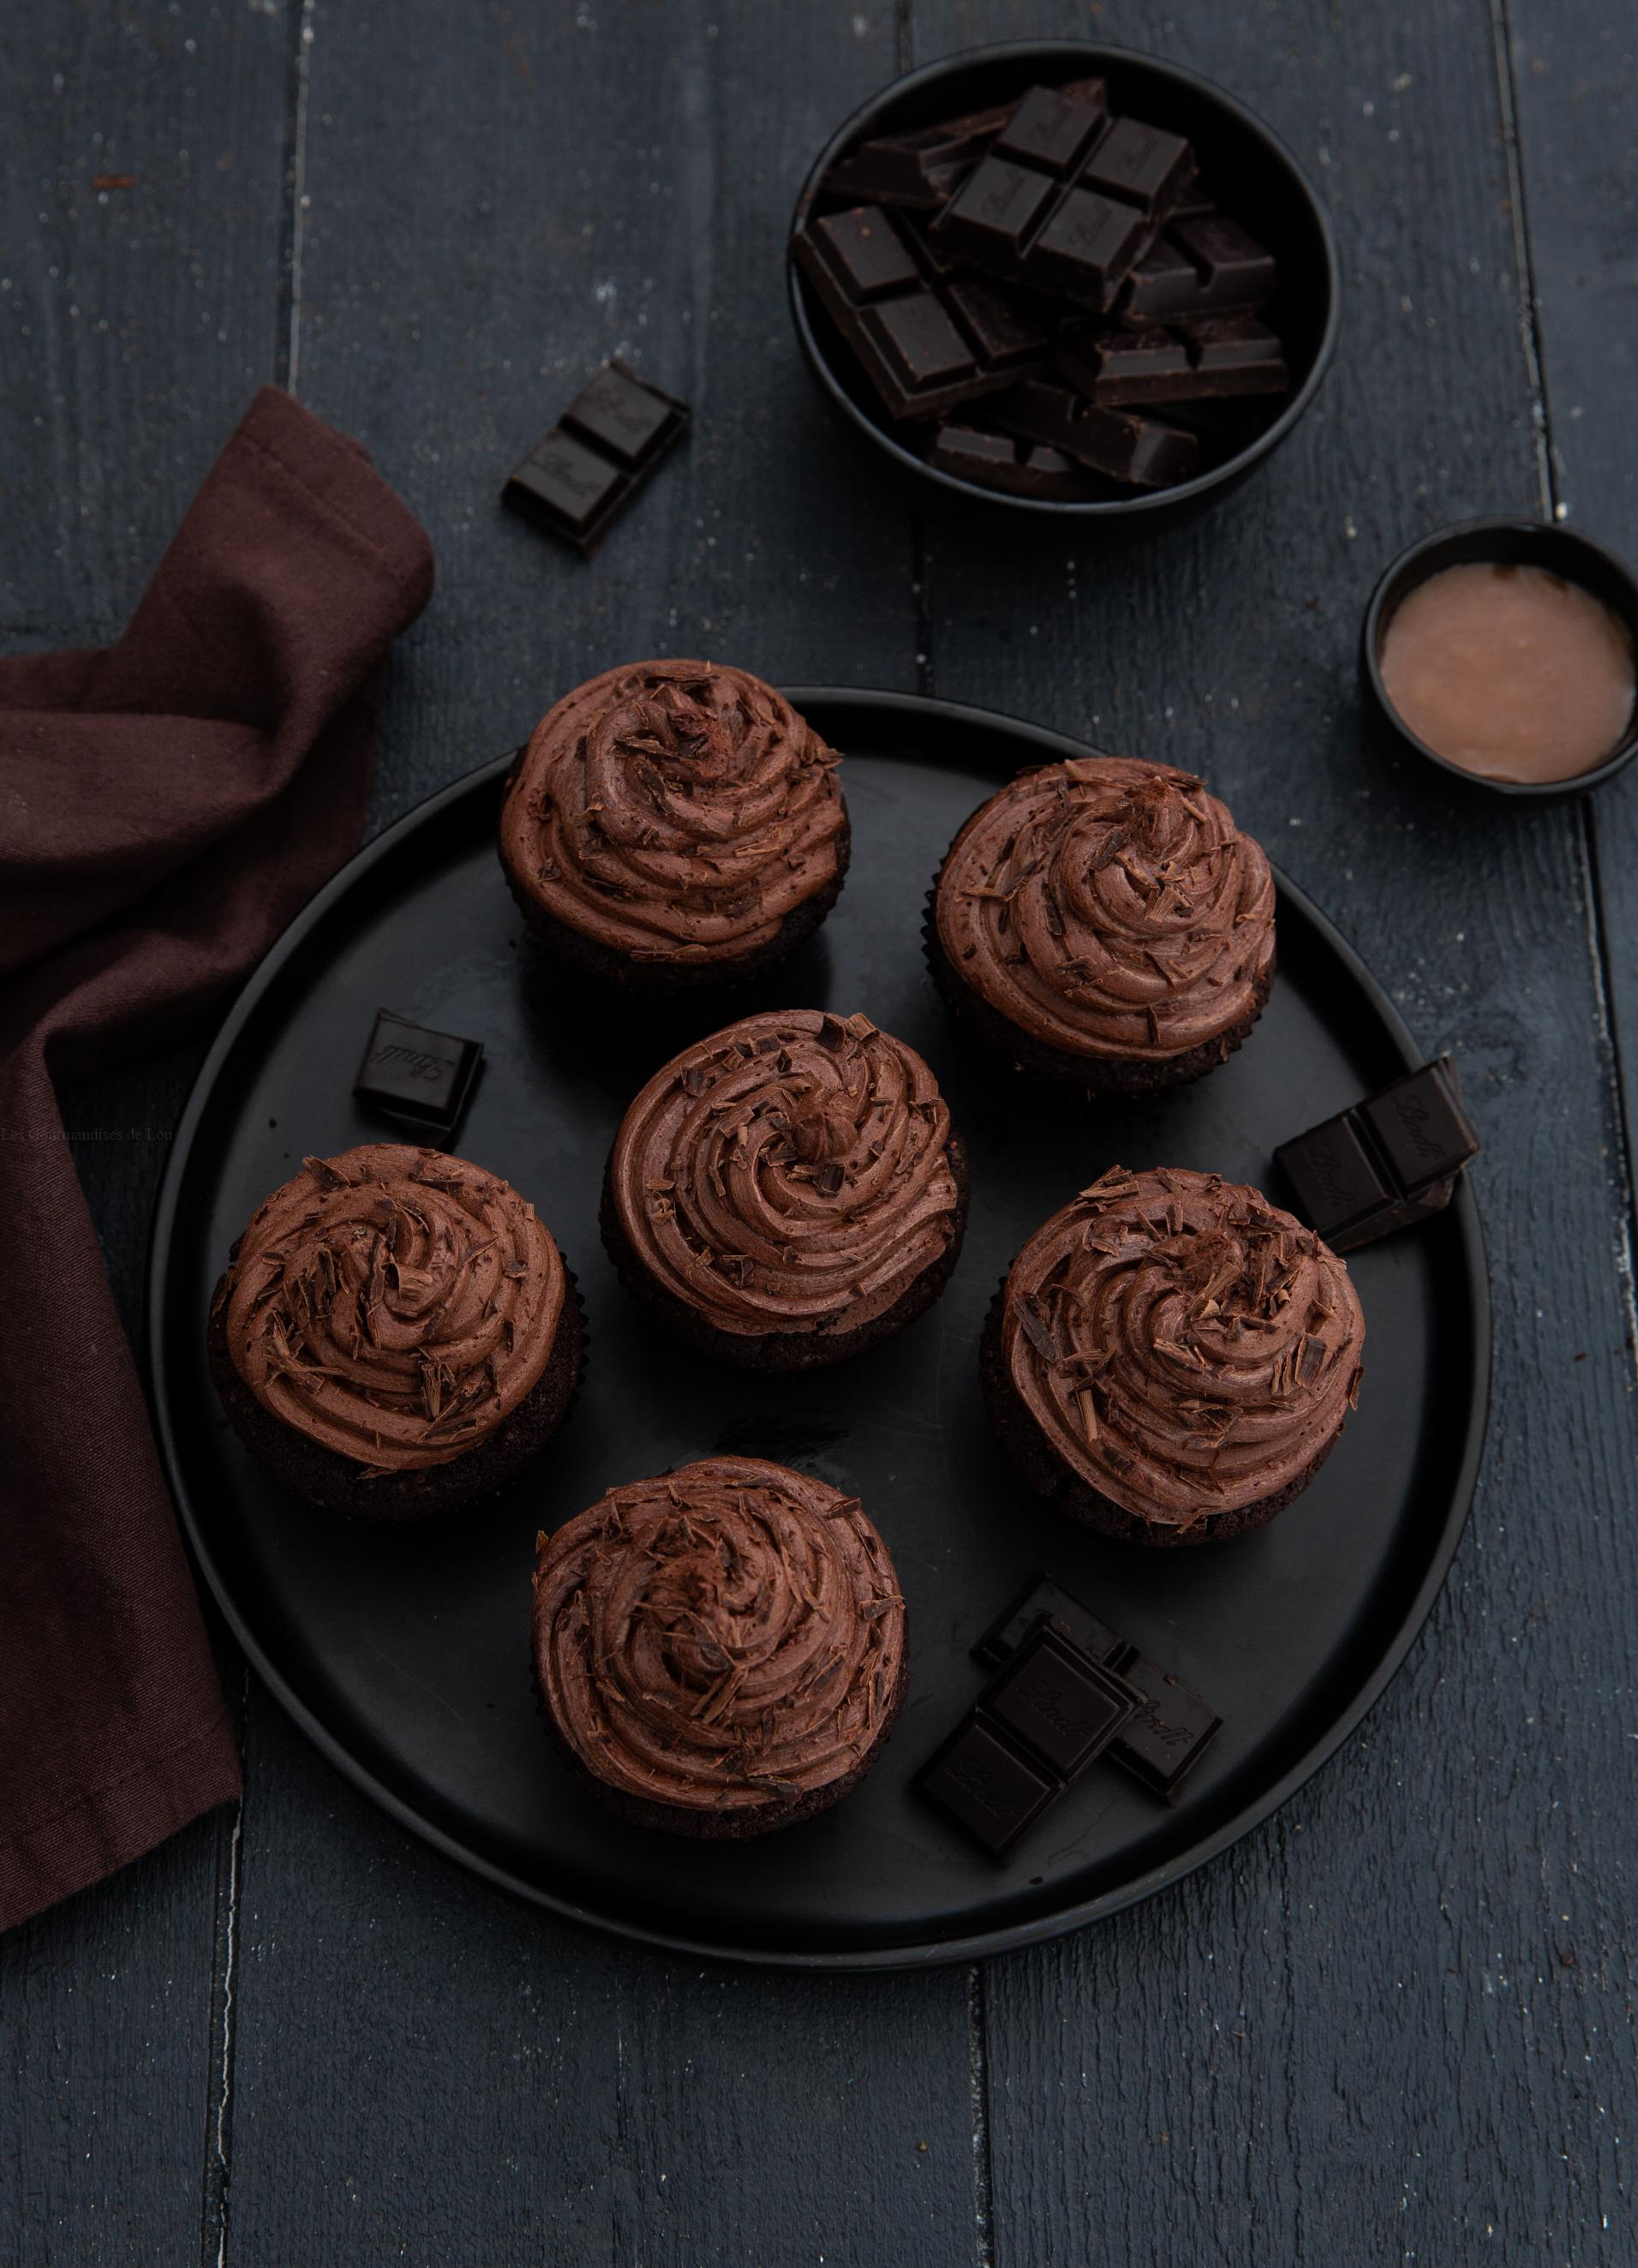 Cupcakes au chocolat coeur coulant caramel